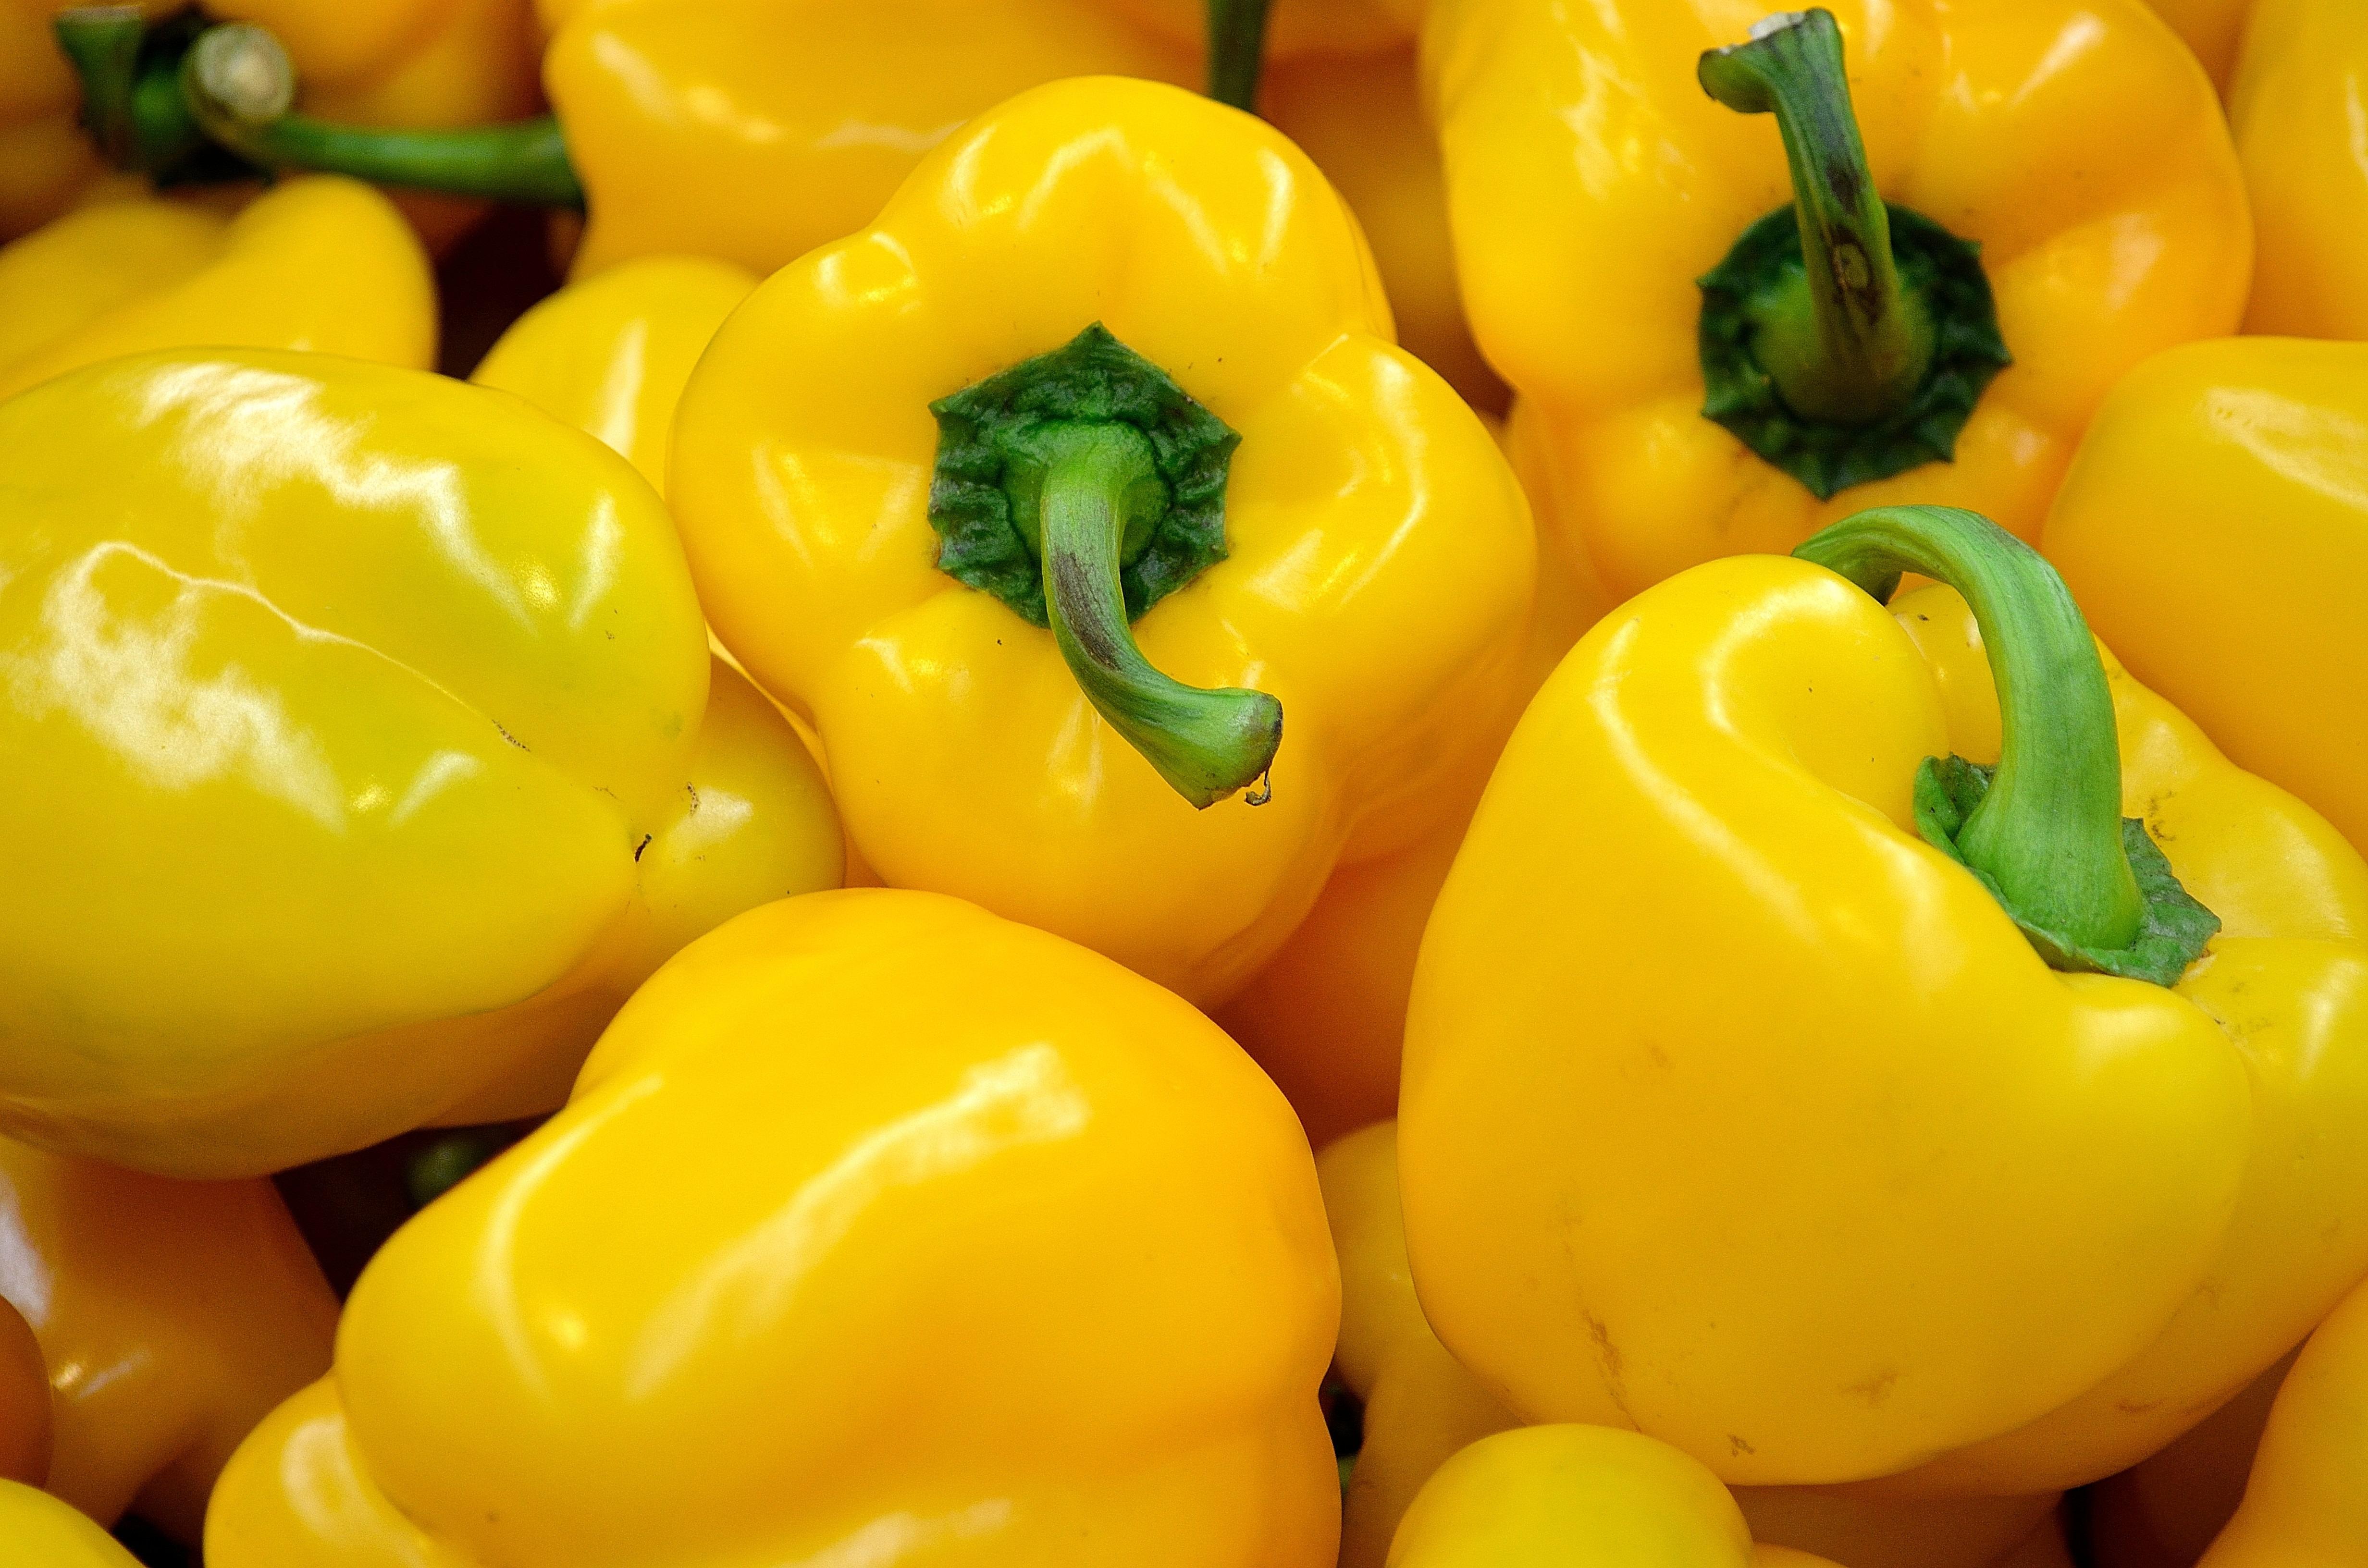 Yellow Pepper, Veg, Vegetable, Yellow, Spice, HQ Photo